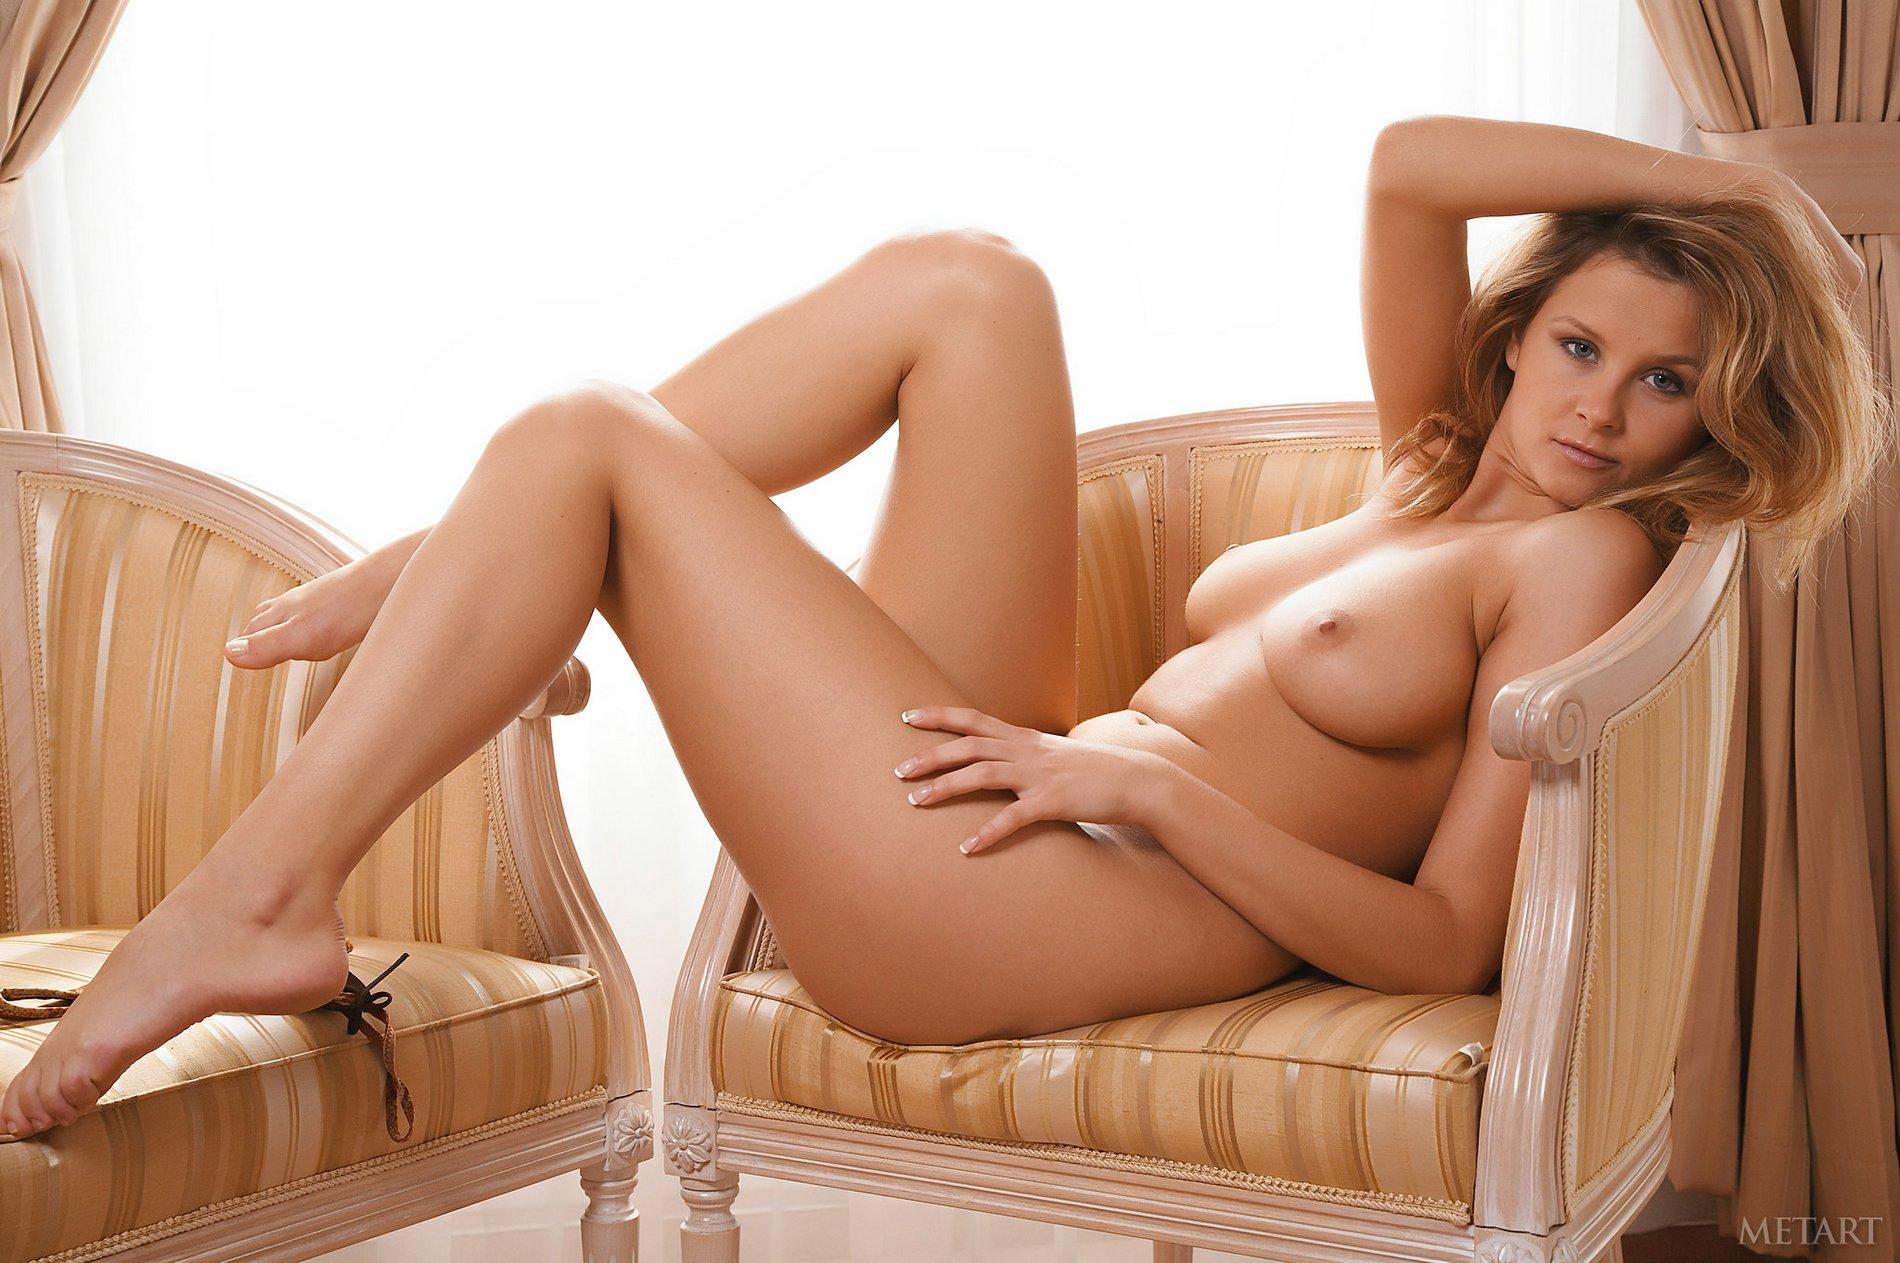 Have won Zoe mcdonald nude above